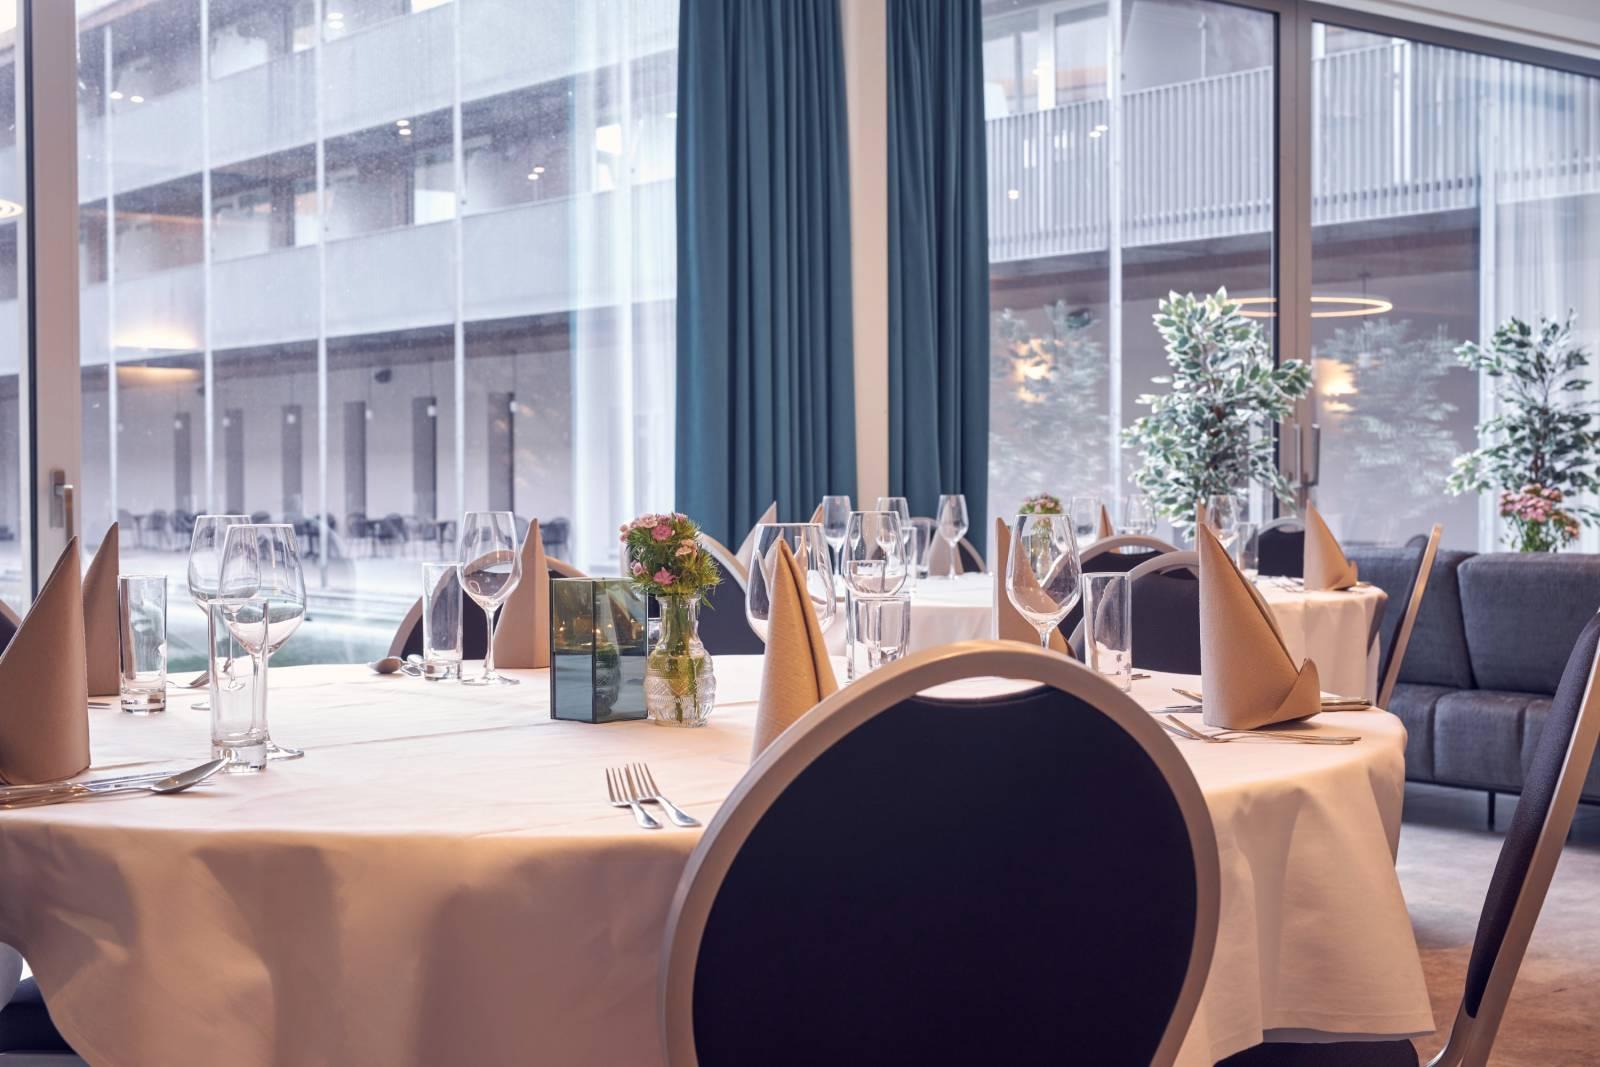 Feestal - Van der Valk hotel Mechelen - House of Weddings (16)